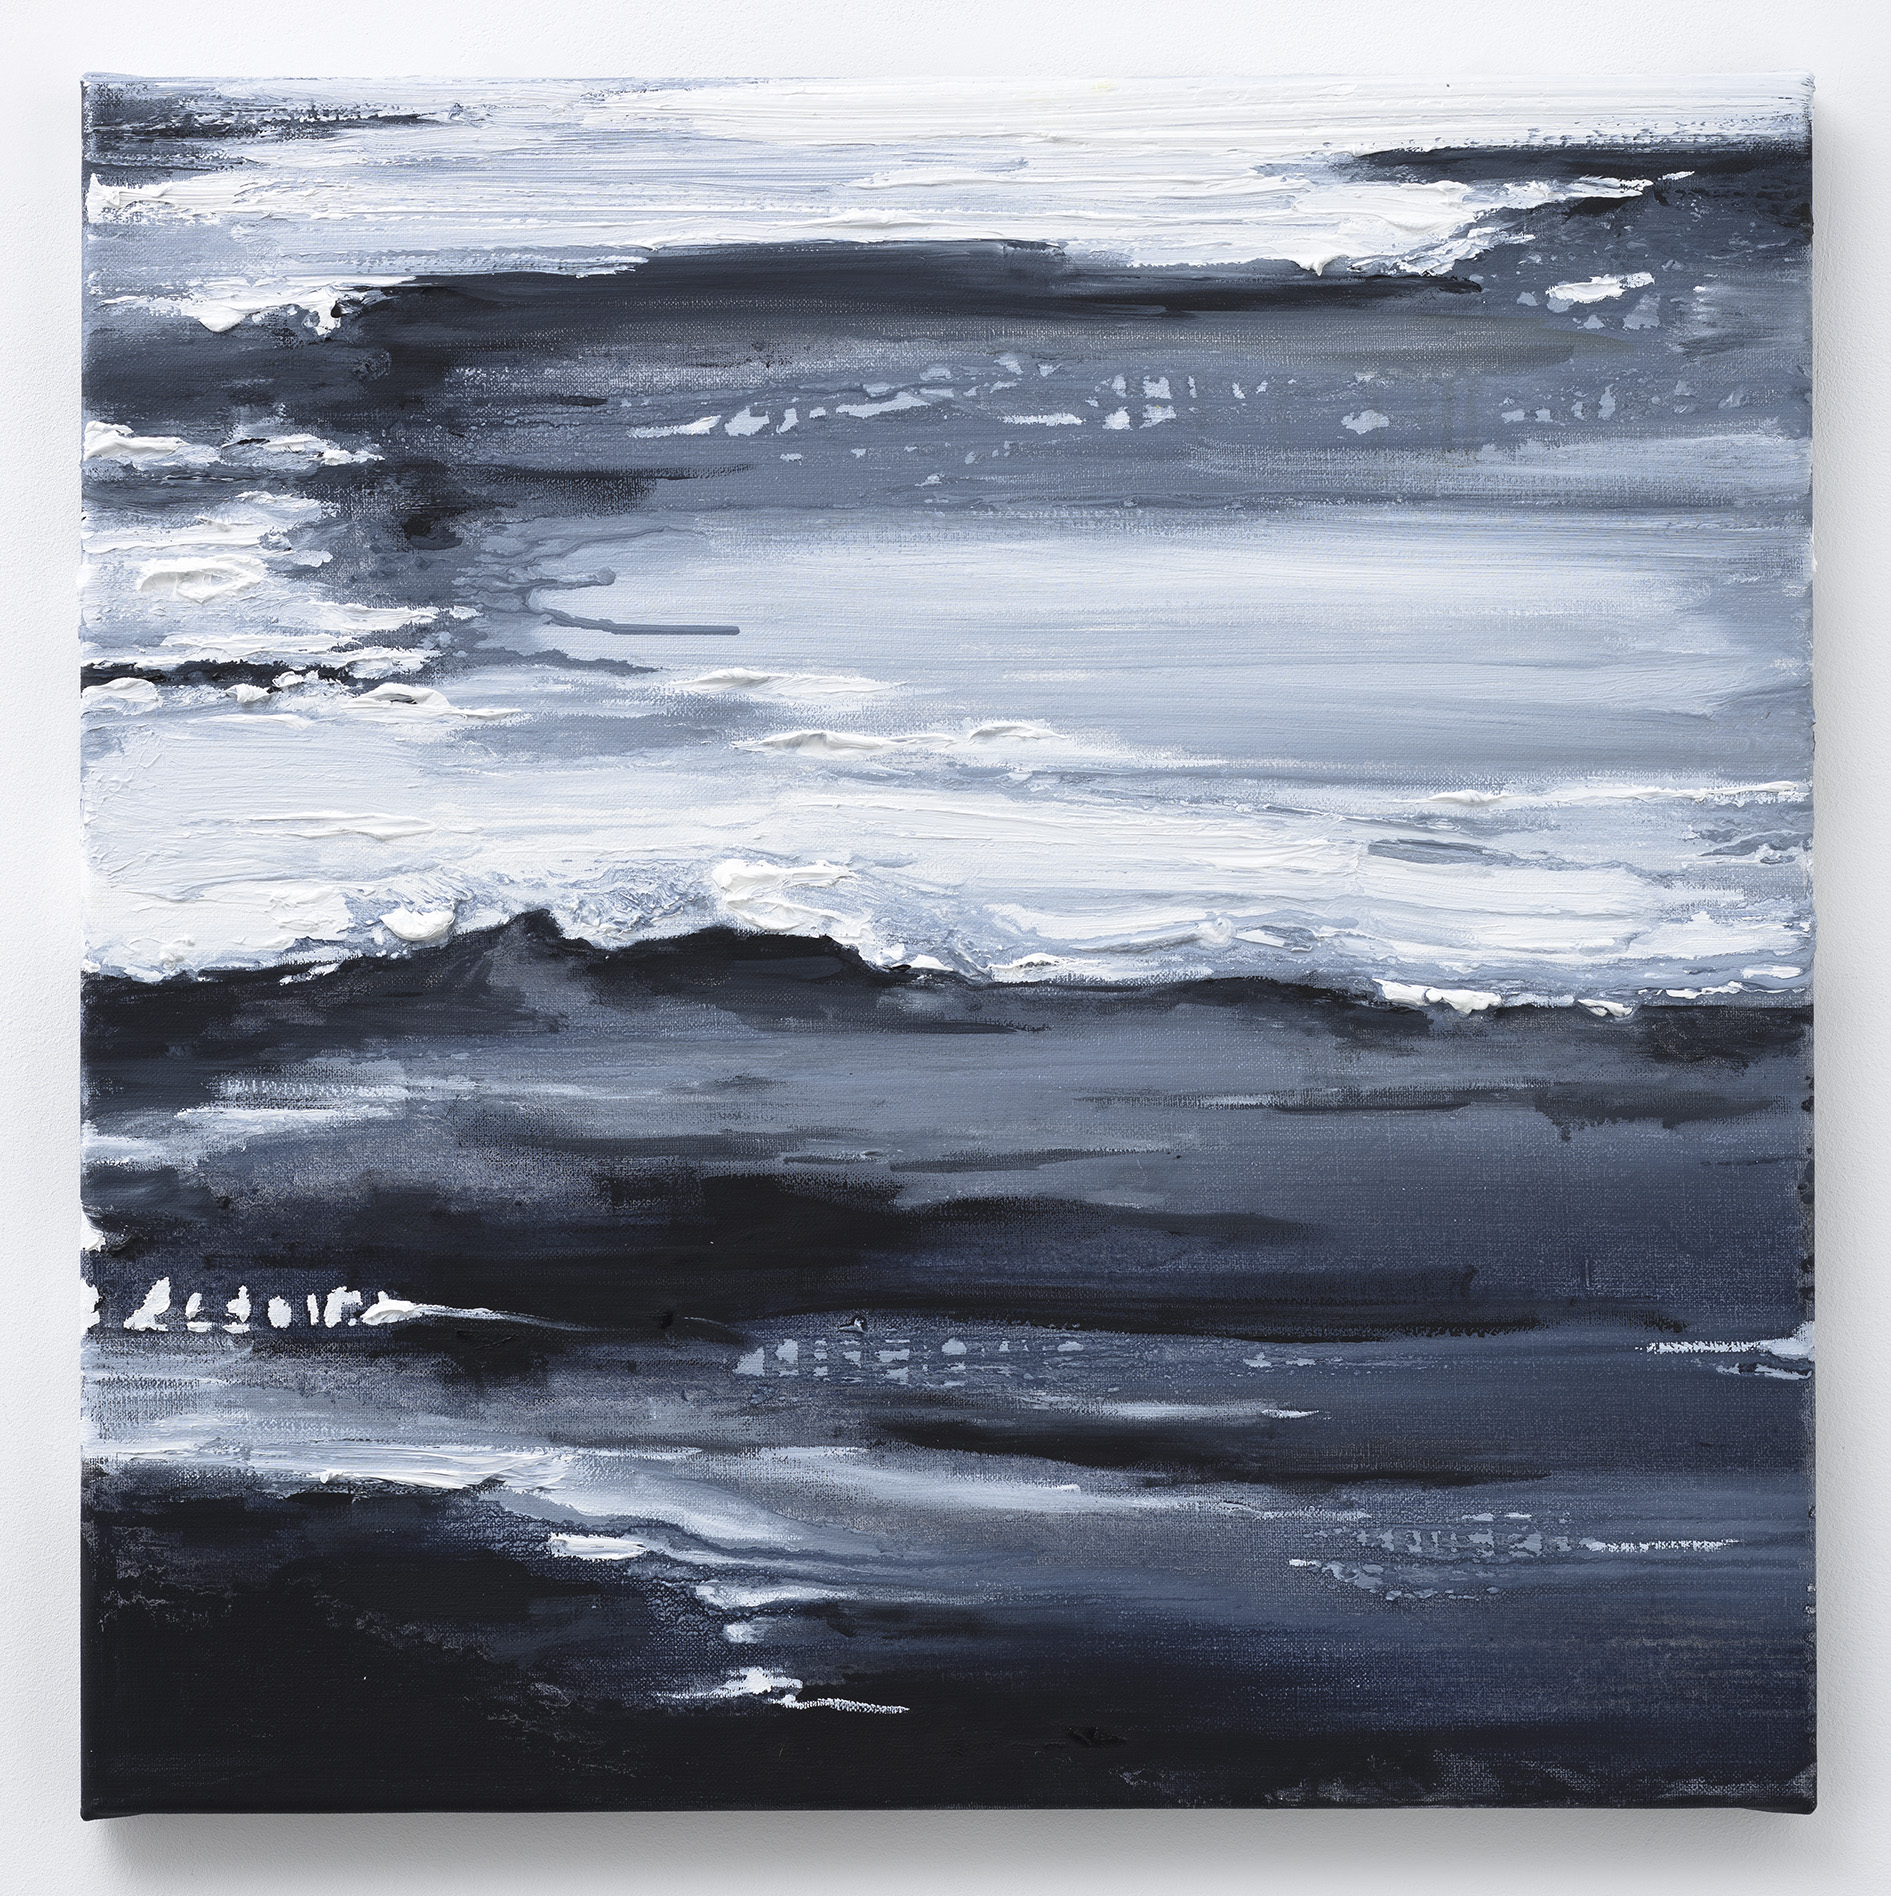 """Paisagen do Infinito"" 50 x 50 cm. oil on linen 2015"